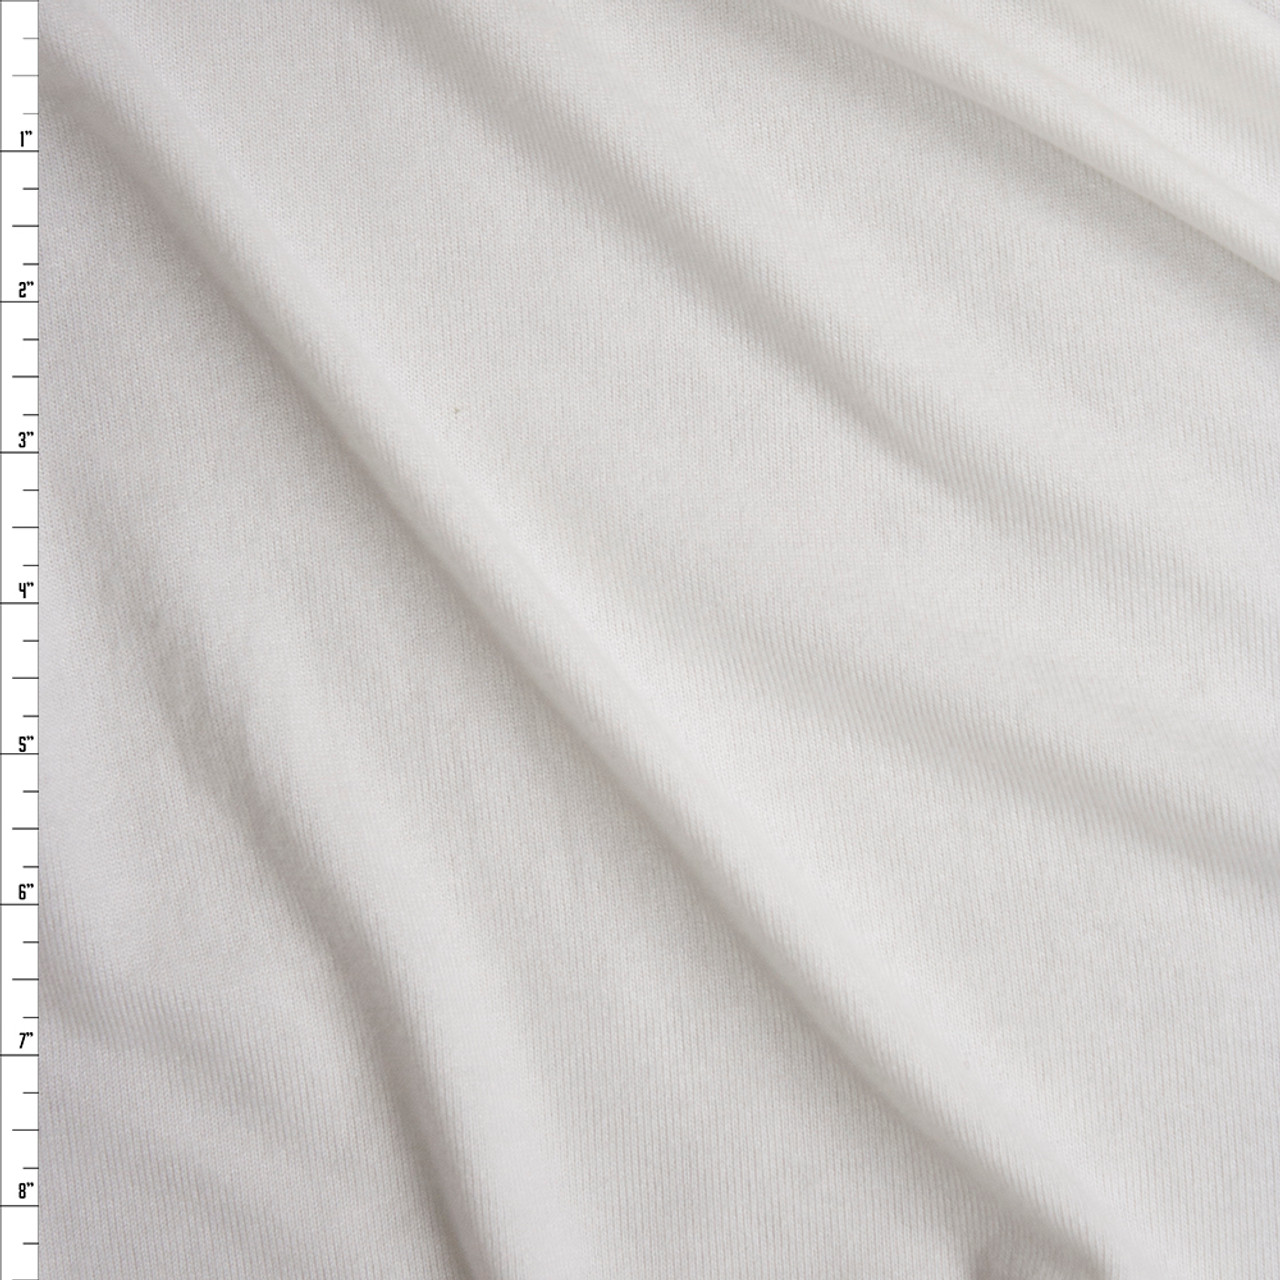 65c6712a58c Cali Fabrics White Brushed Stretch Sweater Knit Fabric by the Yard